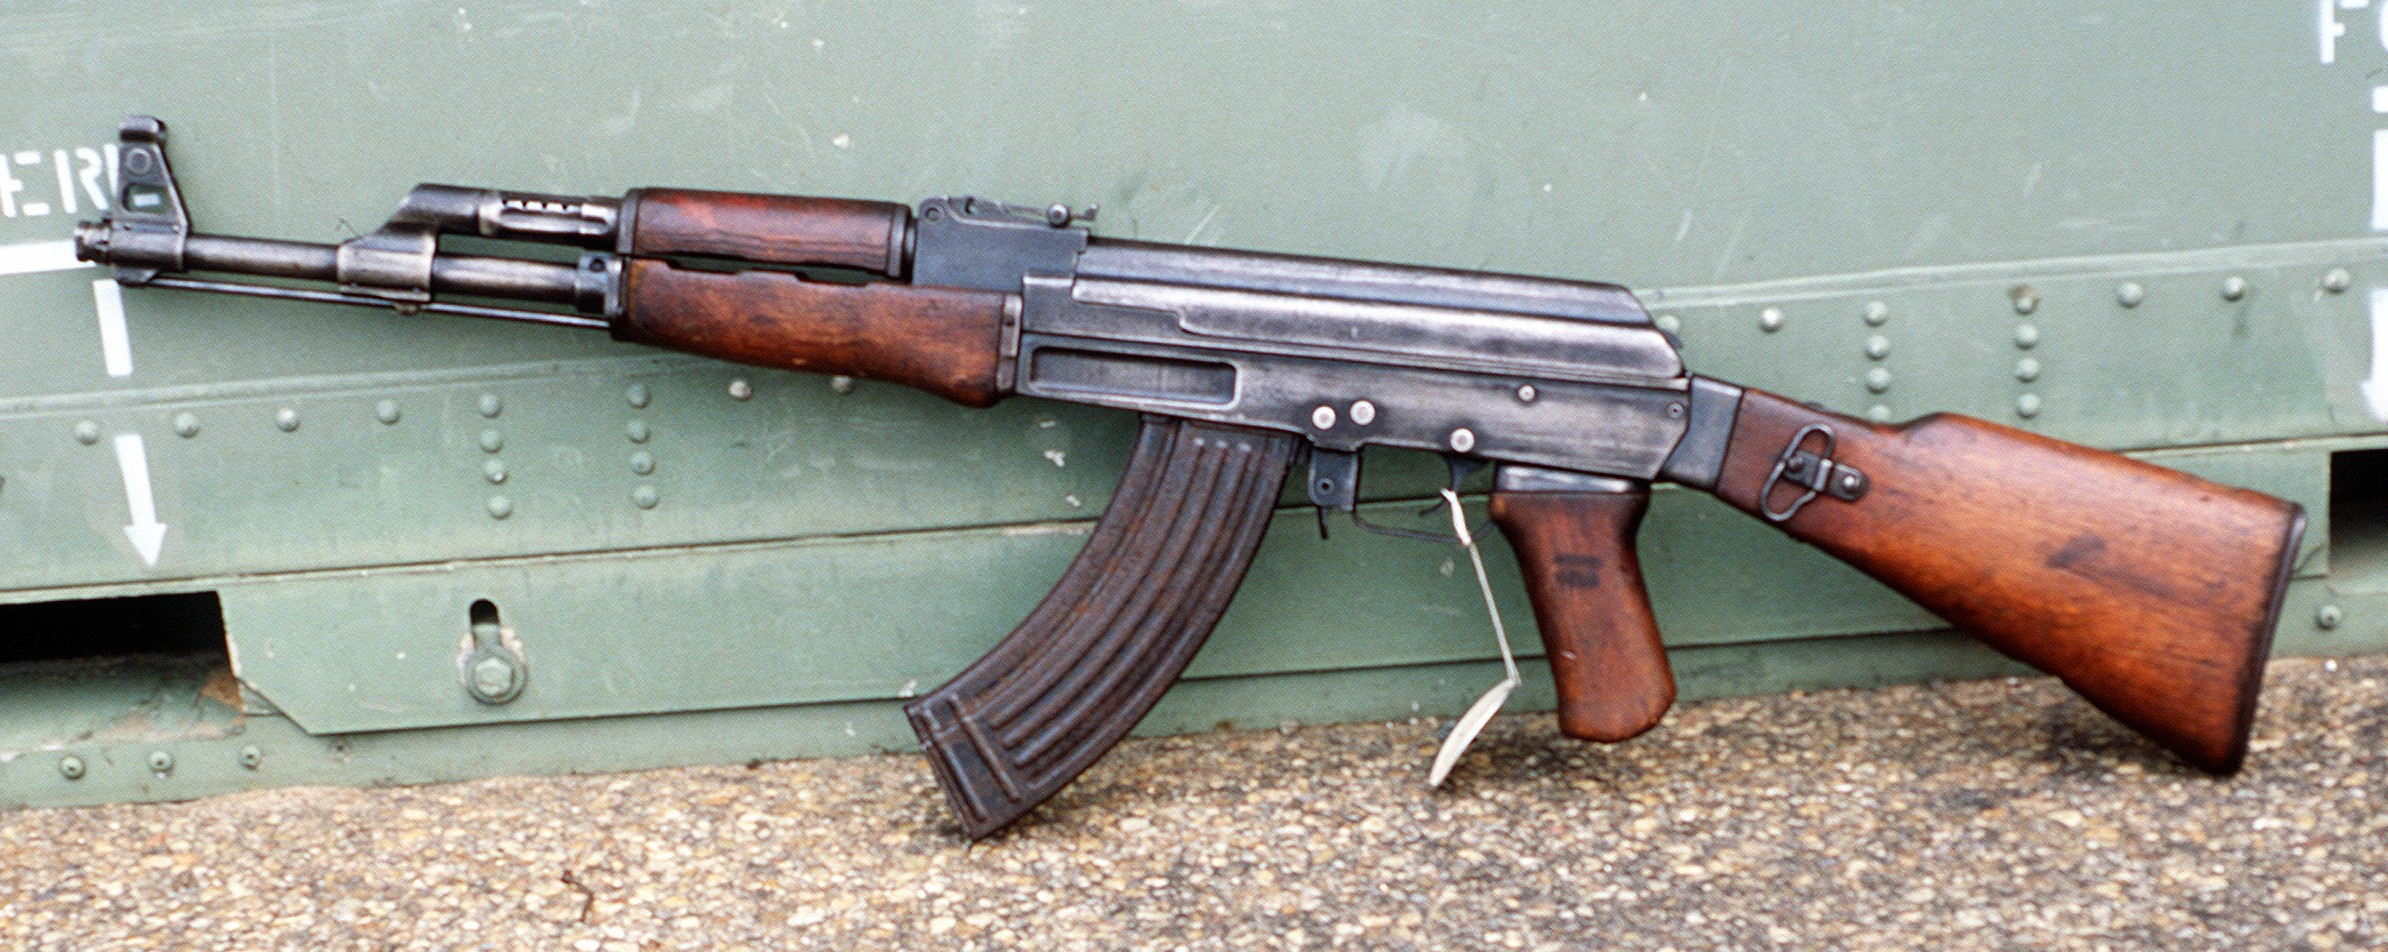 http://www.giotsar.com/articles/images/AK-47.jpg